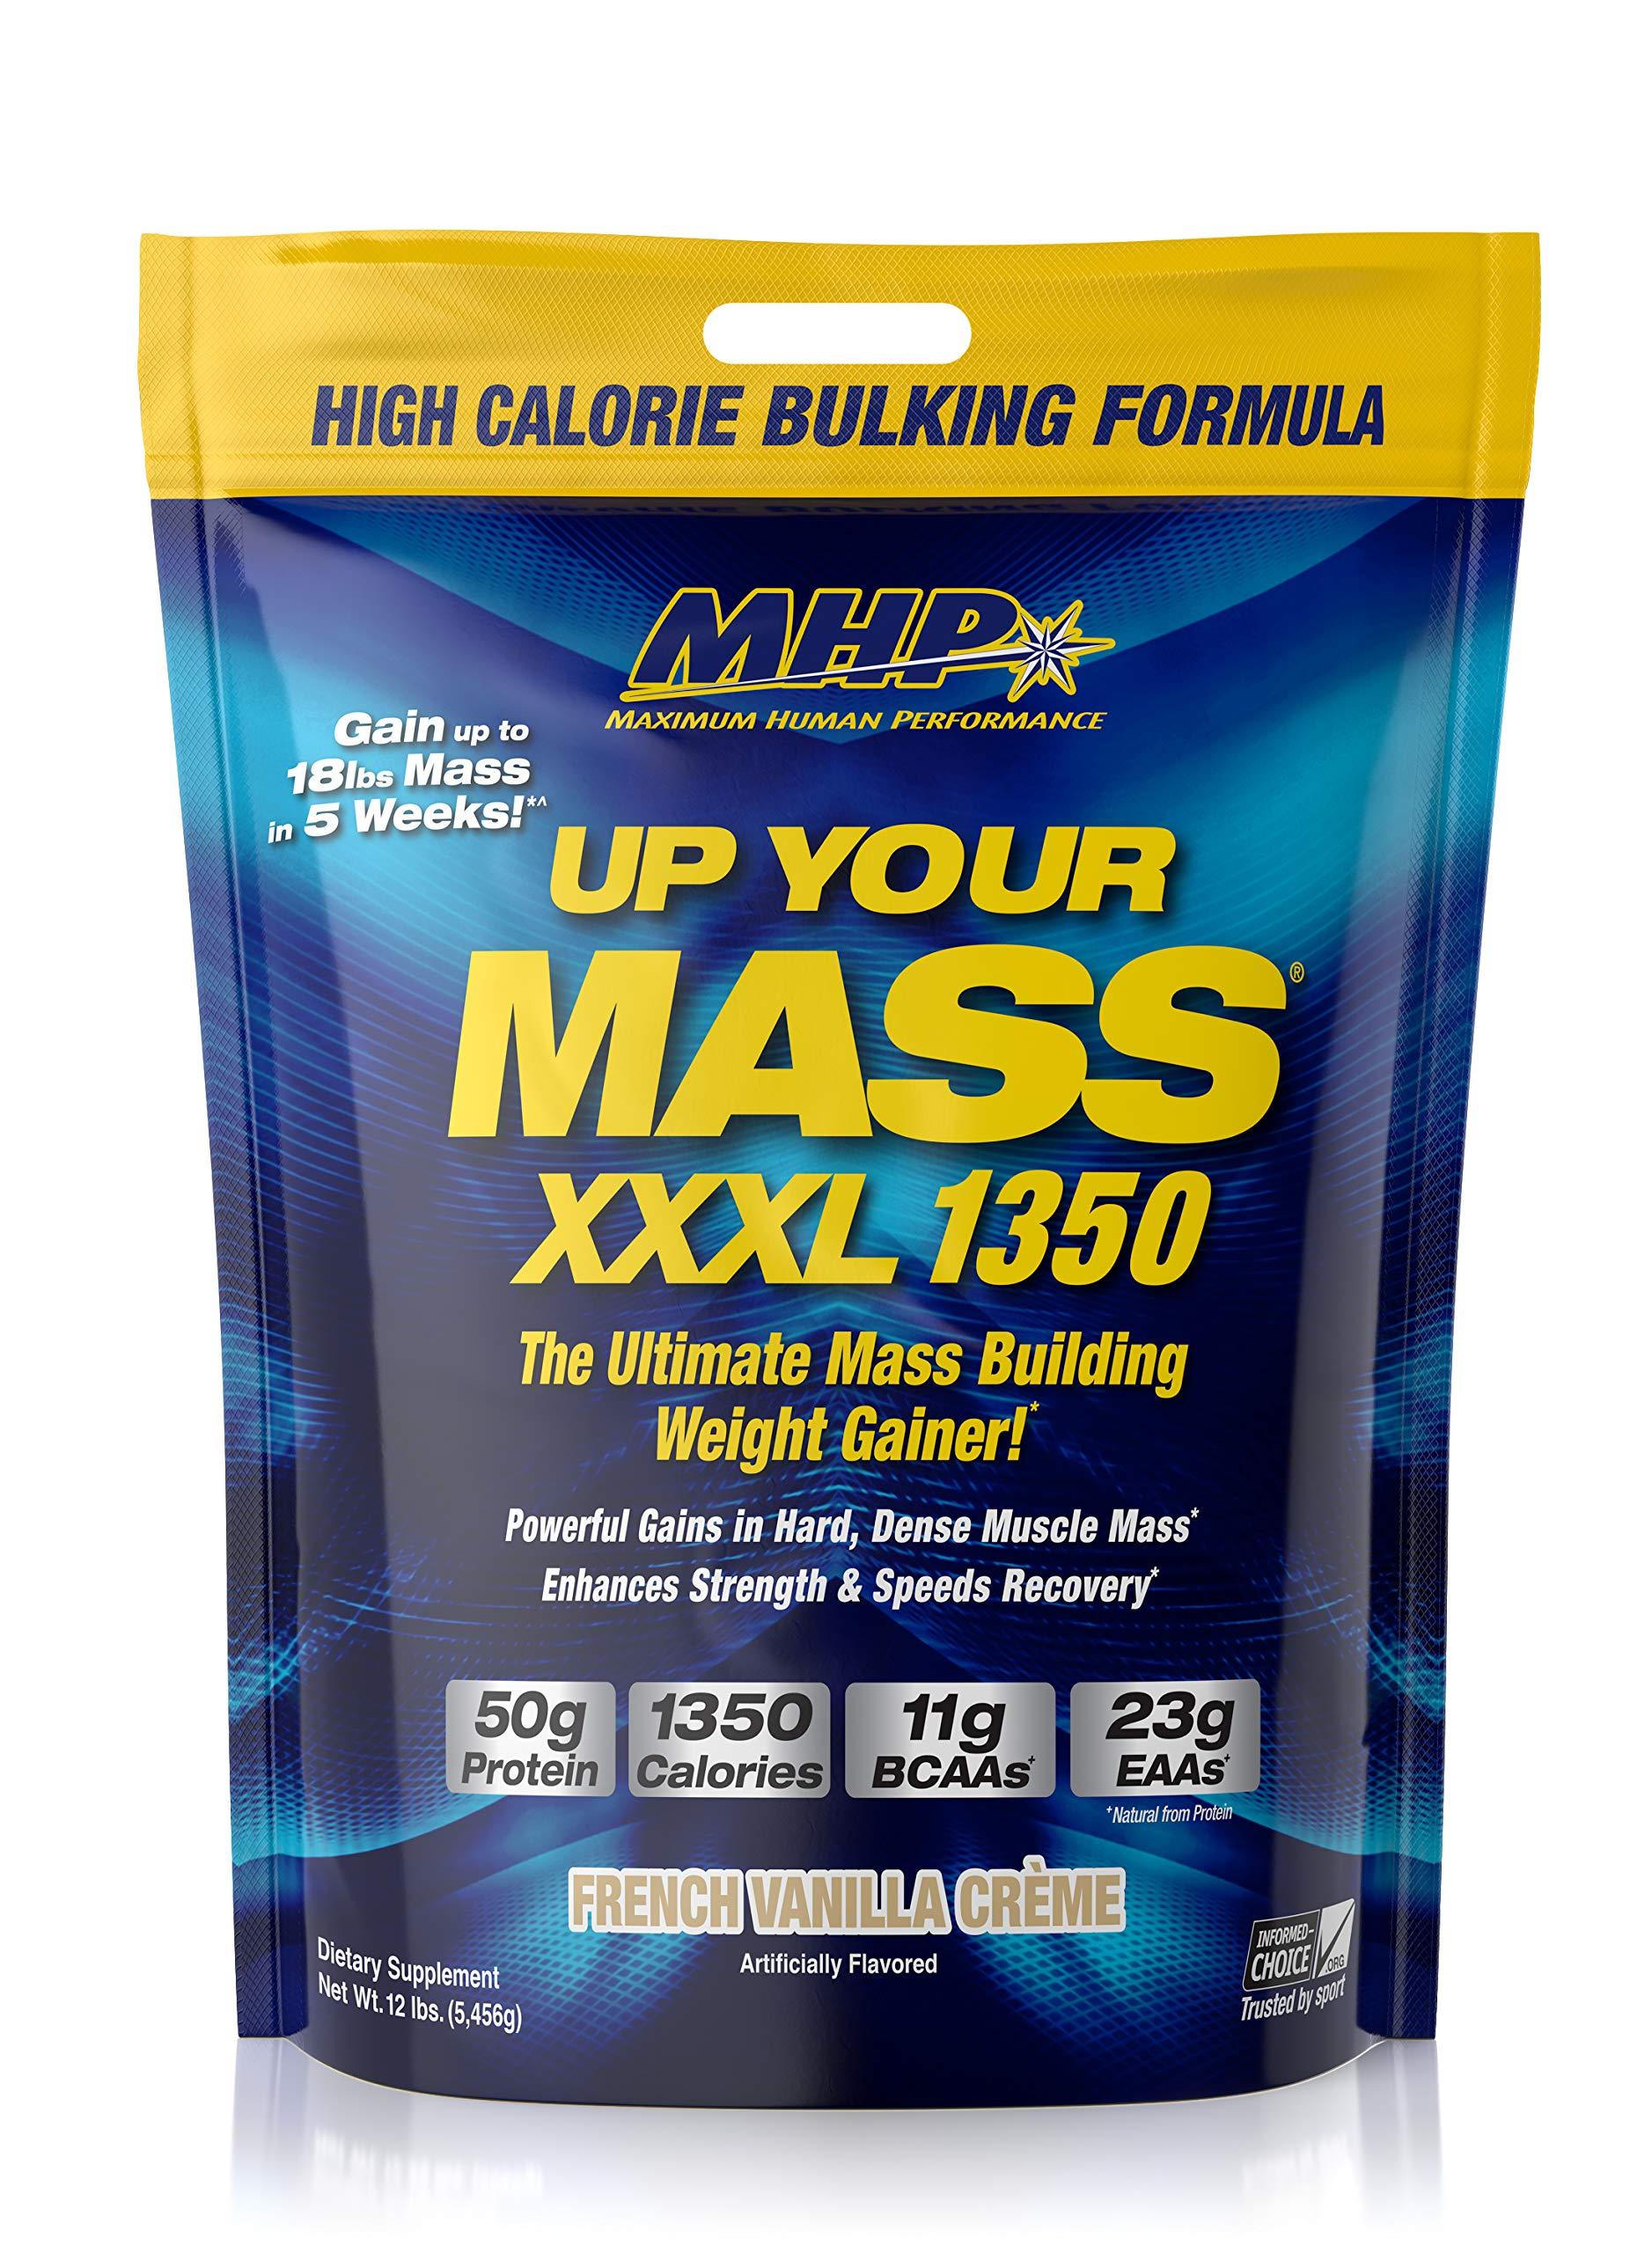 MHP UYM XXXL 1350 Mass Building Weight Gainer, Muscle Mass Gains, w/50g Protein, High Calories, 11g BCAAs, Leucine, French Vanilla Creme, 16 Servings